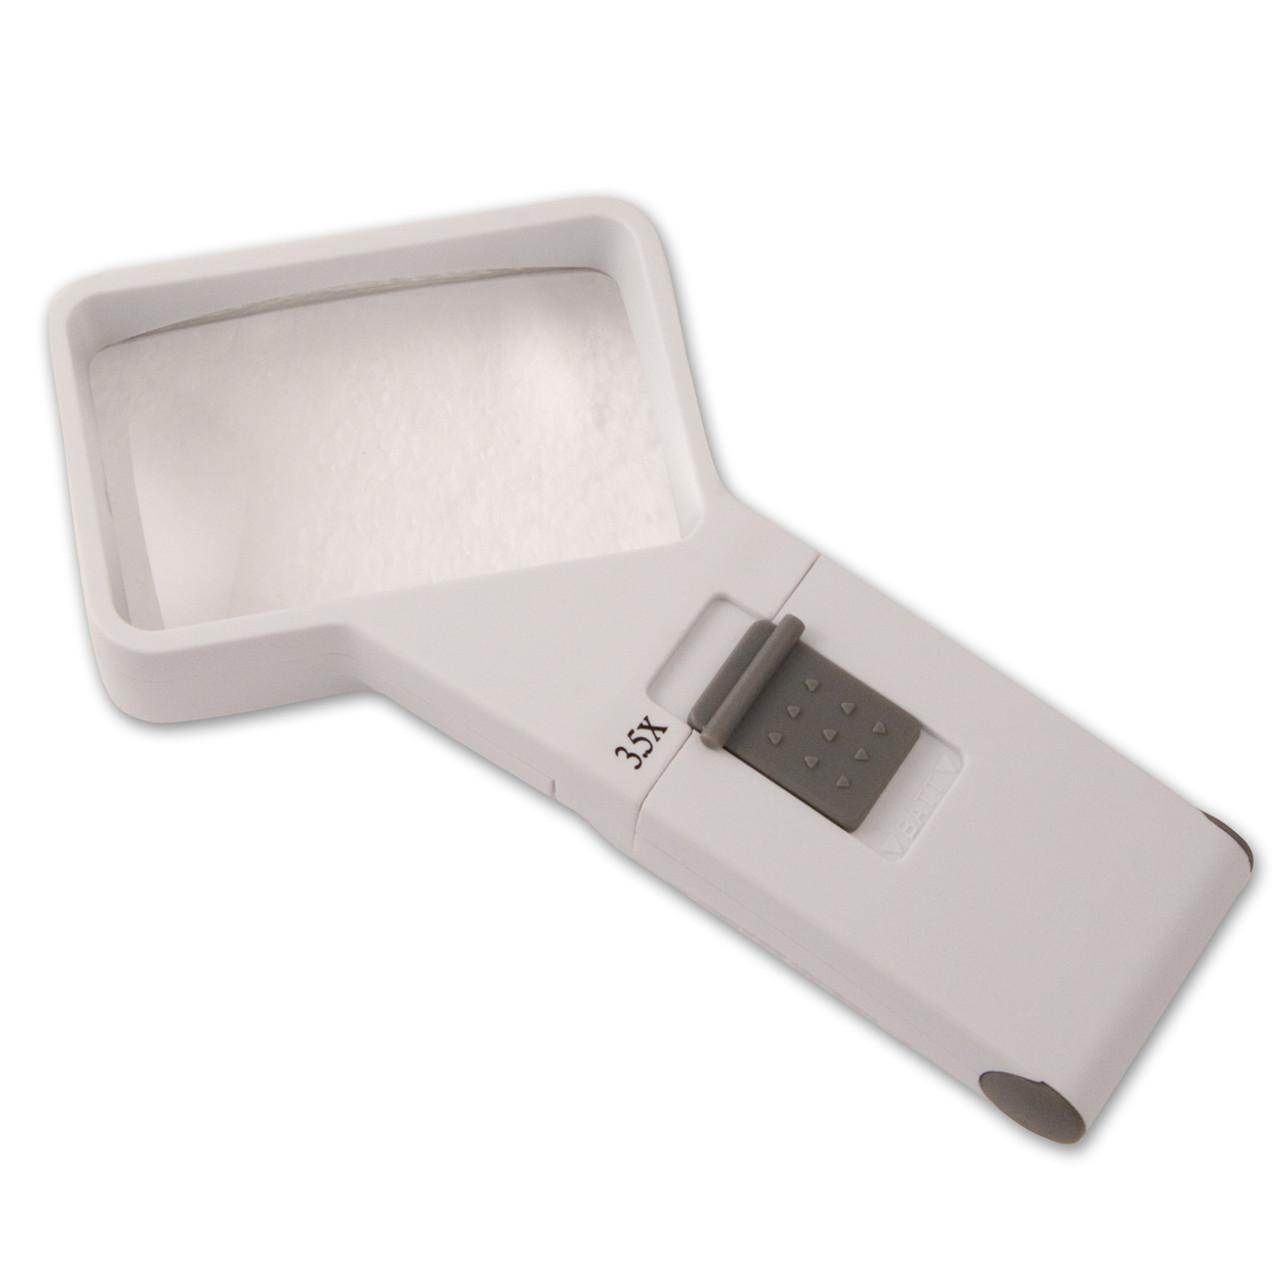 Handheld Magnifier 3.5X / 10D Rectangular